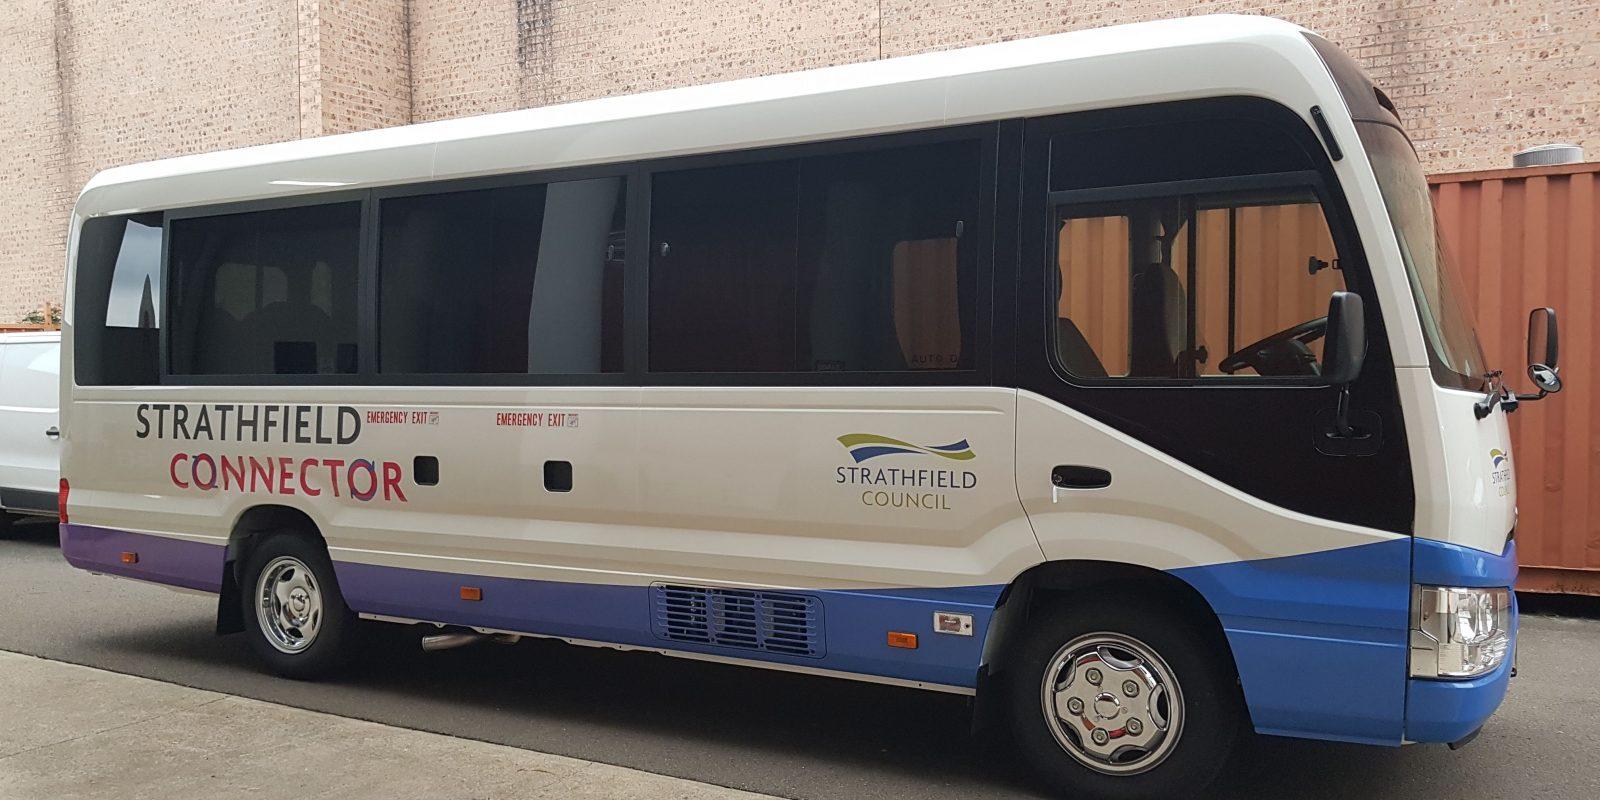 Strathfield Connector Bus Wrap